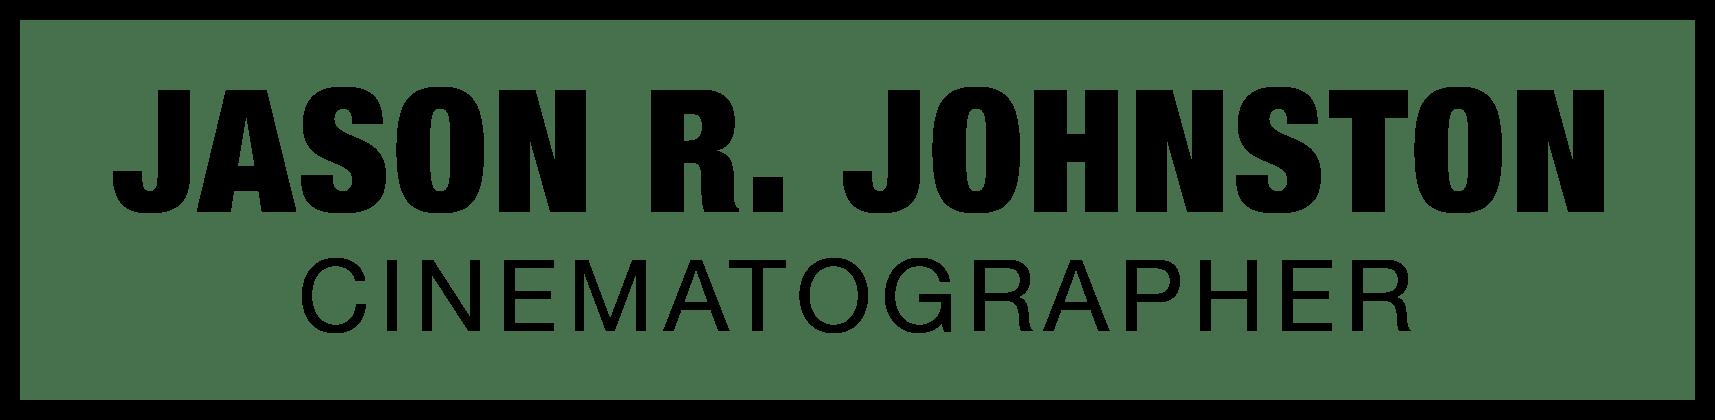 Jason R. Johnston